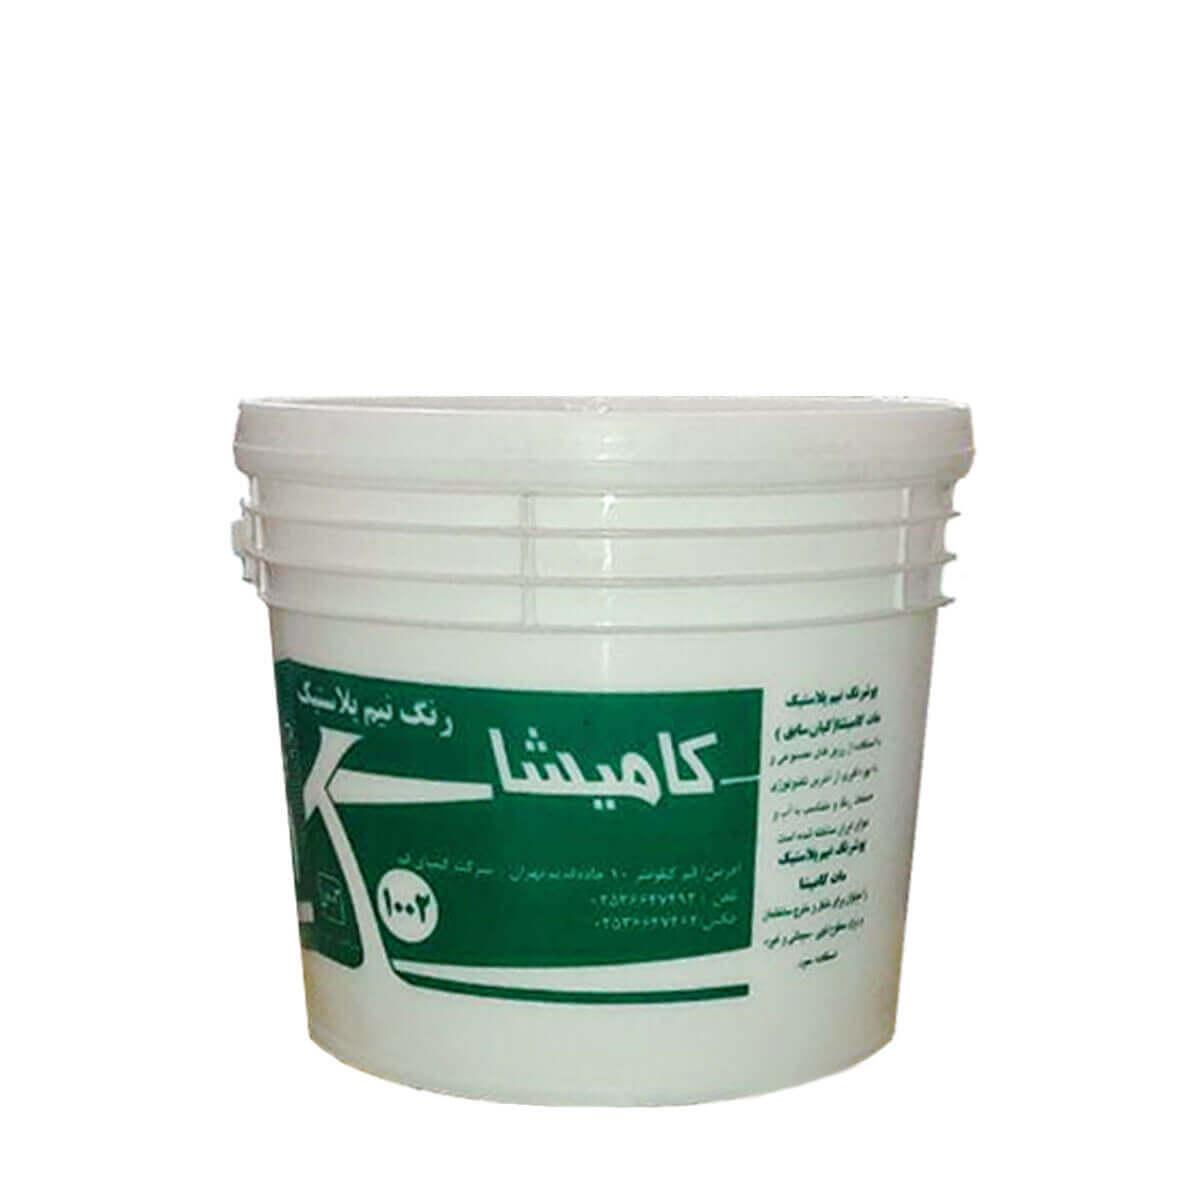 رنگ نیم پلاستیک کیمیا درجه یک کامیشا